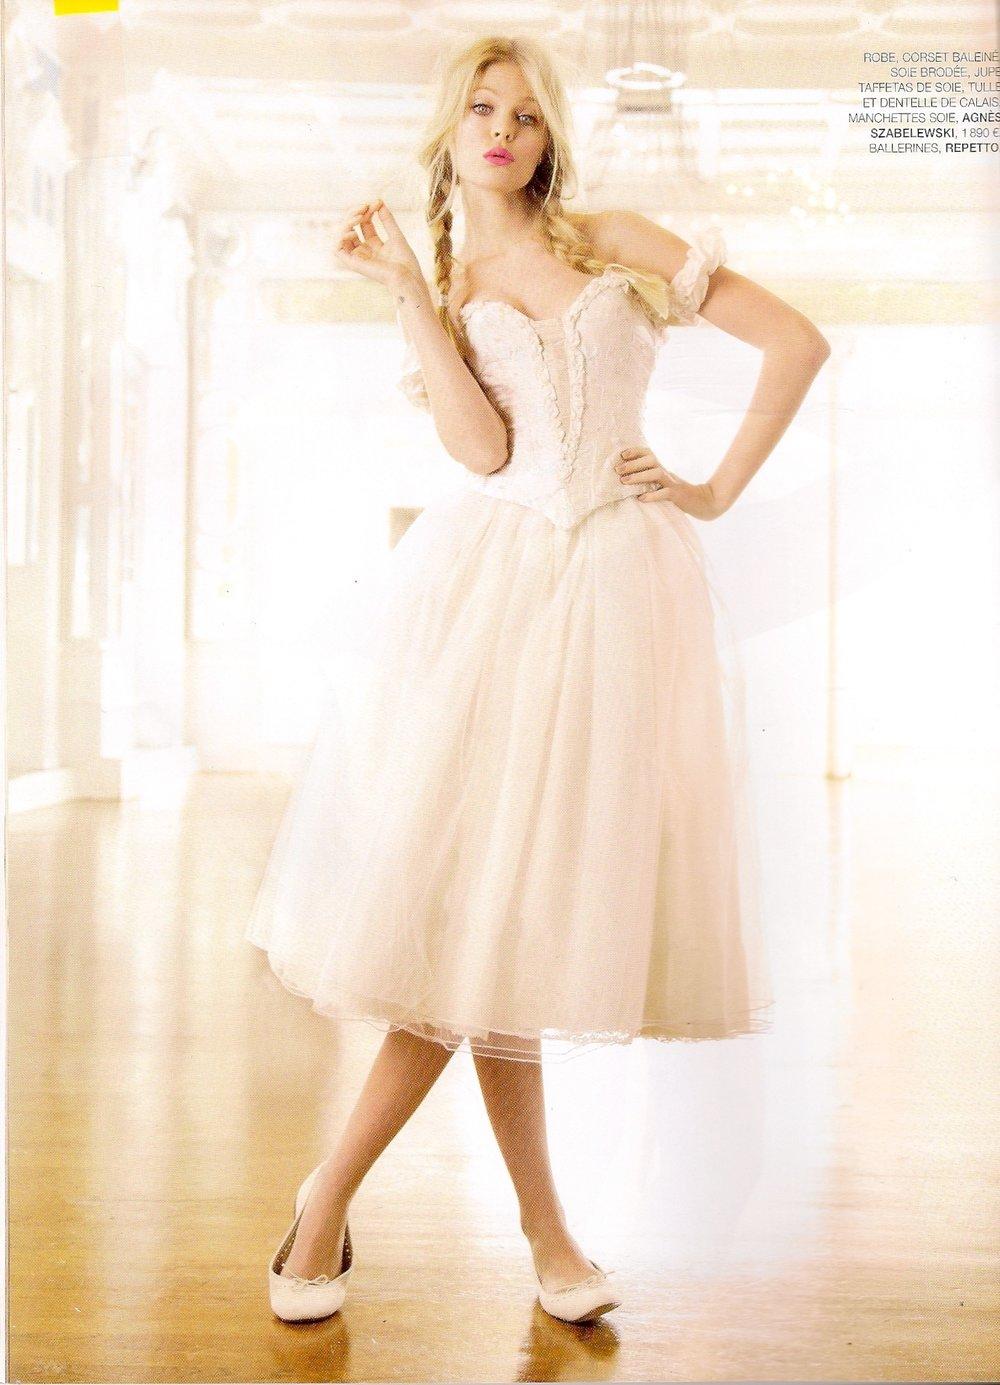 Robe de mariée Ballerine  courte Agnes Szabelewski.jpg